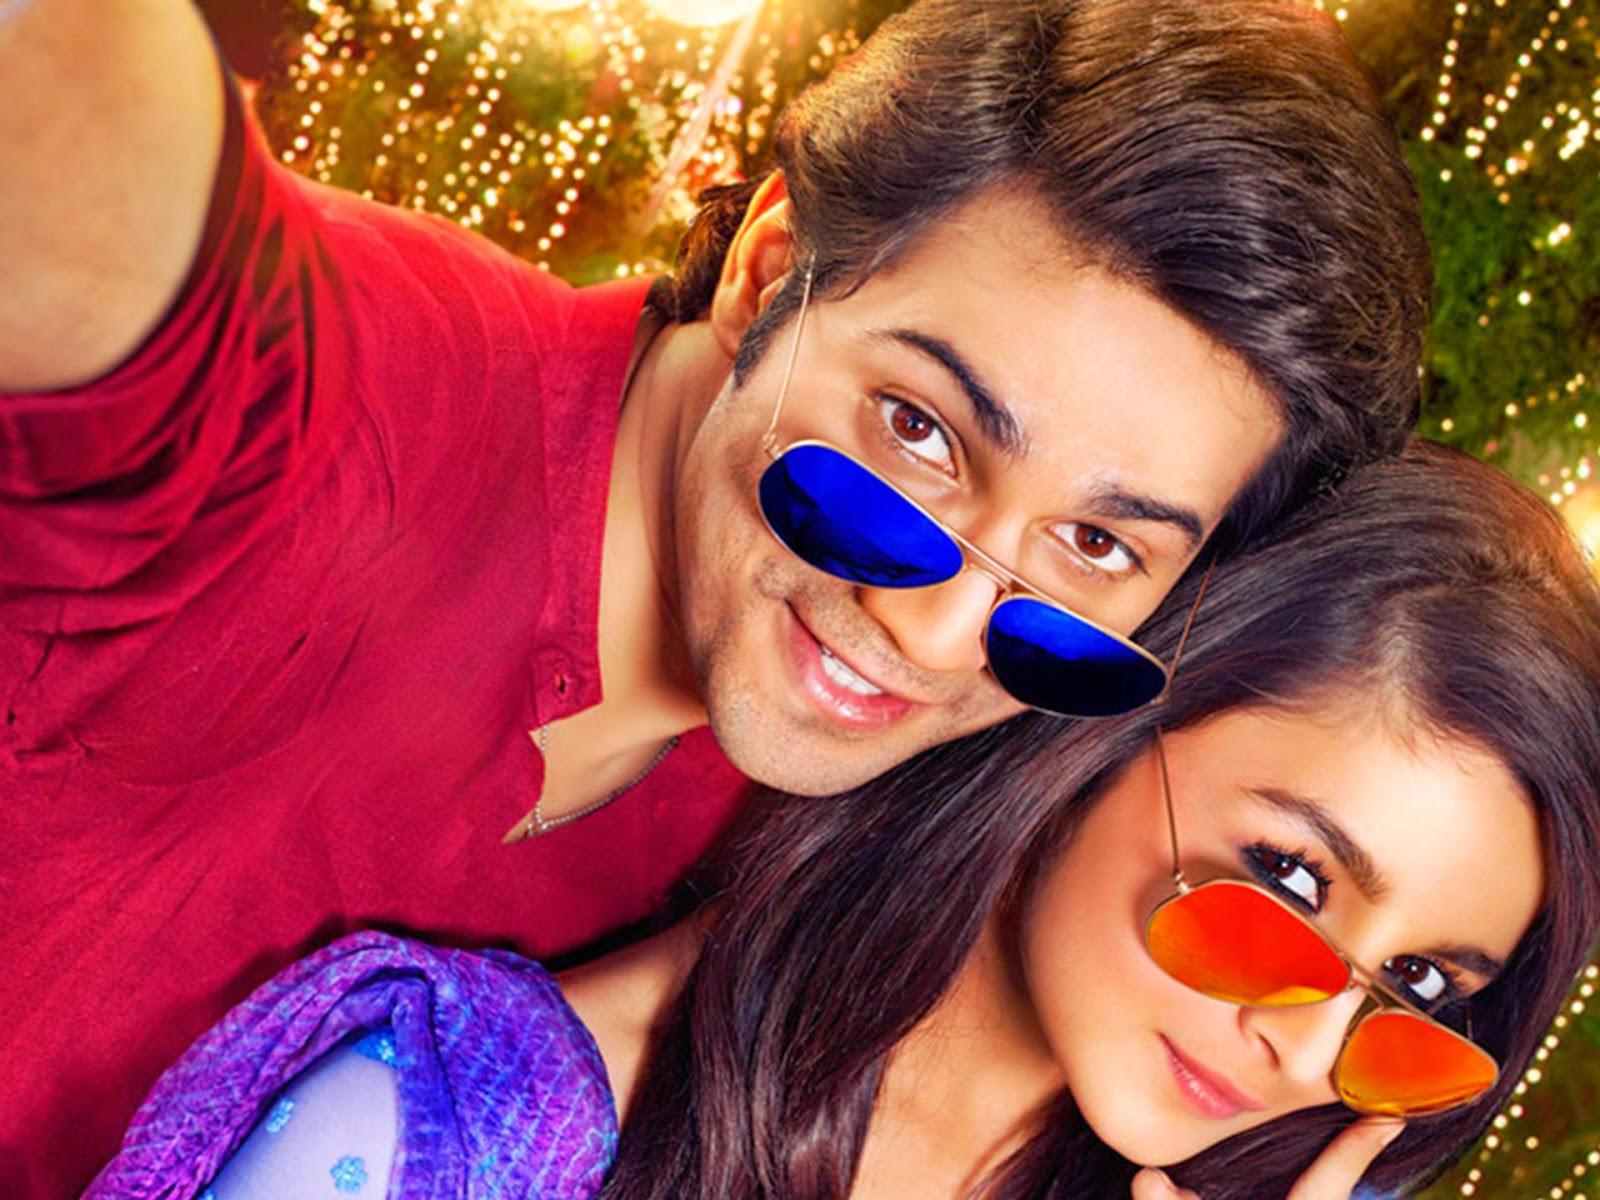 Varun And Alia Hd Wallpapers Humpty Sharma Ki Dulhania Movie Latest Images And